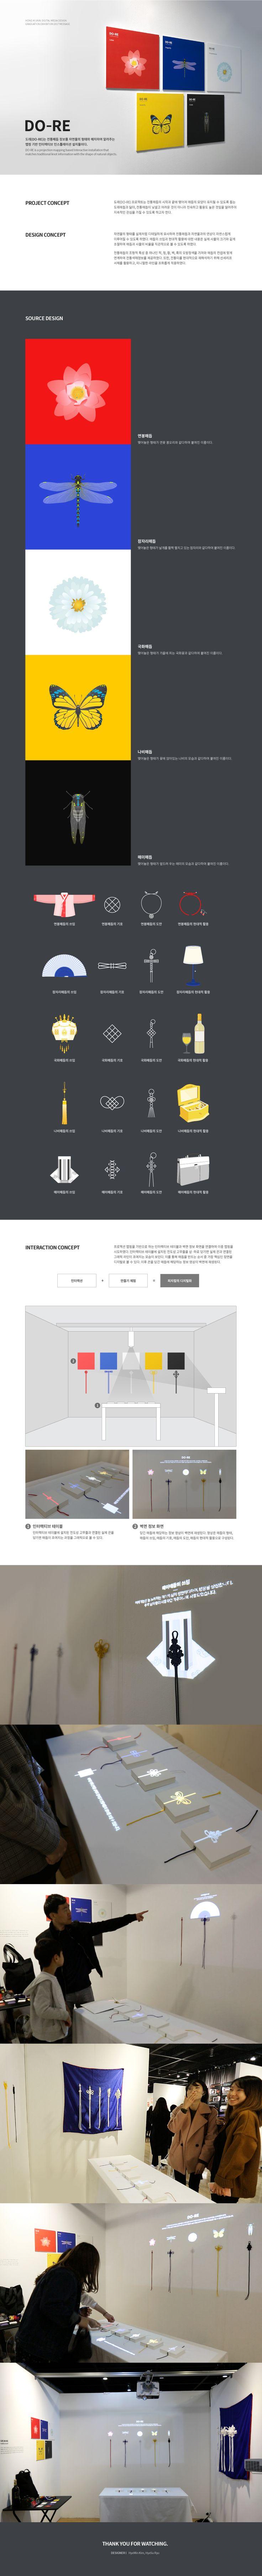 HyeSu Ryu, HyeMin Kim | DORE | Digital Media Design project Class 2017 | Major in Digital Media Design │#hicoda│hicoda.hongik.ac.kr